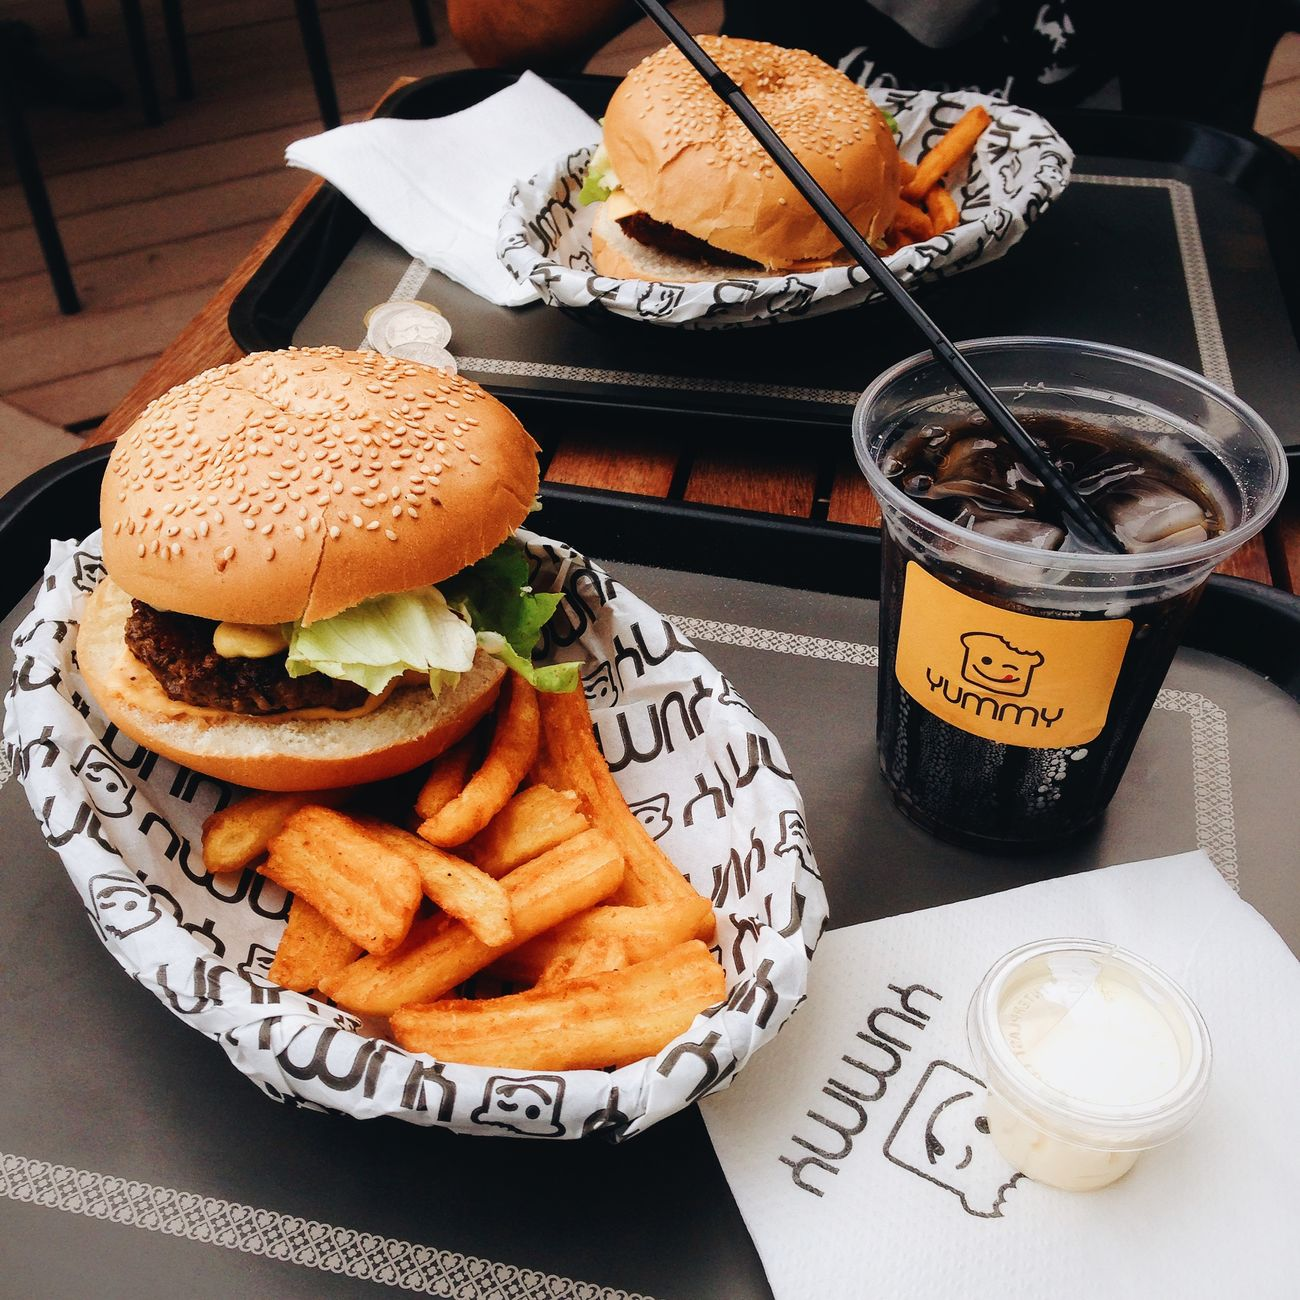 Cheeseburger 🍔 Food Tunis